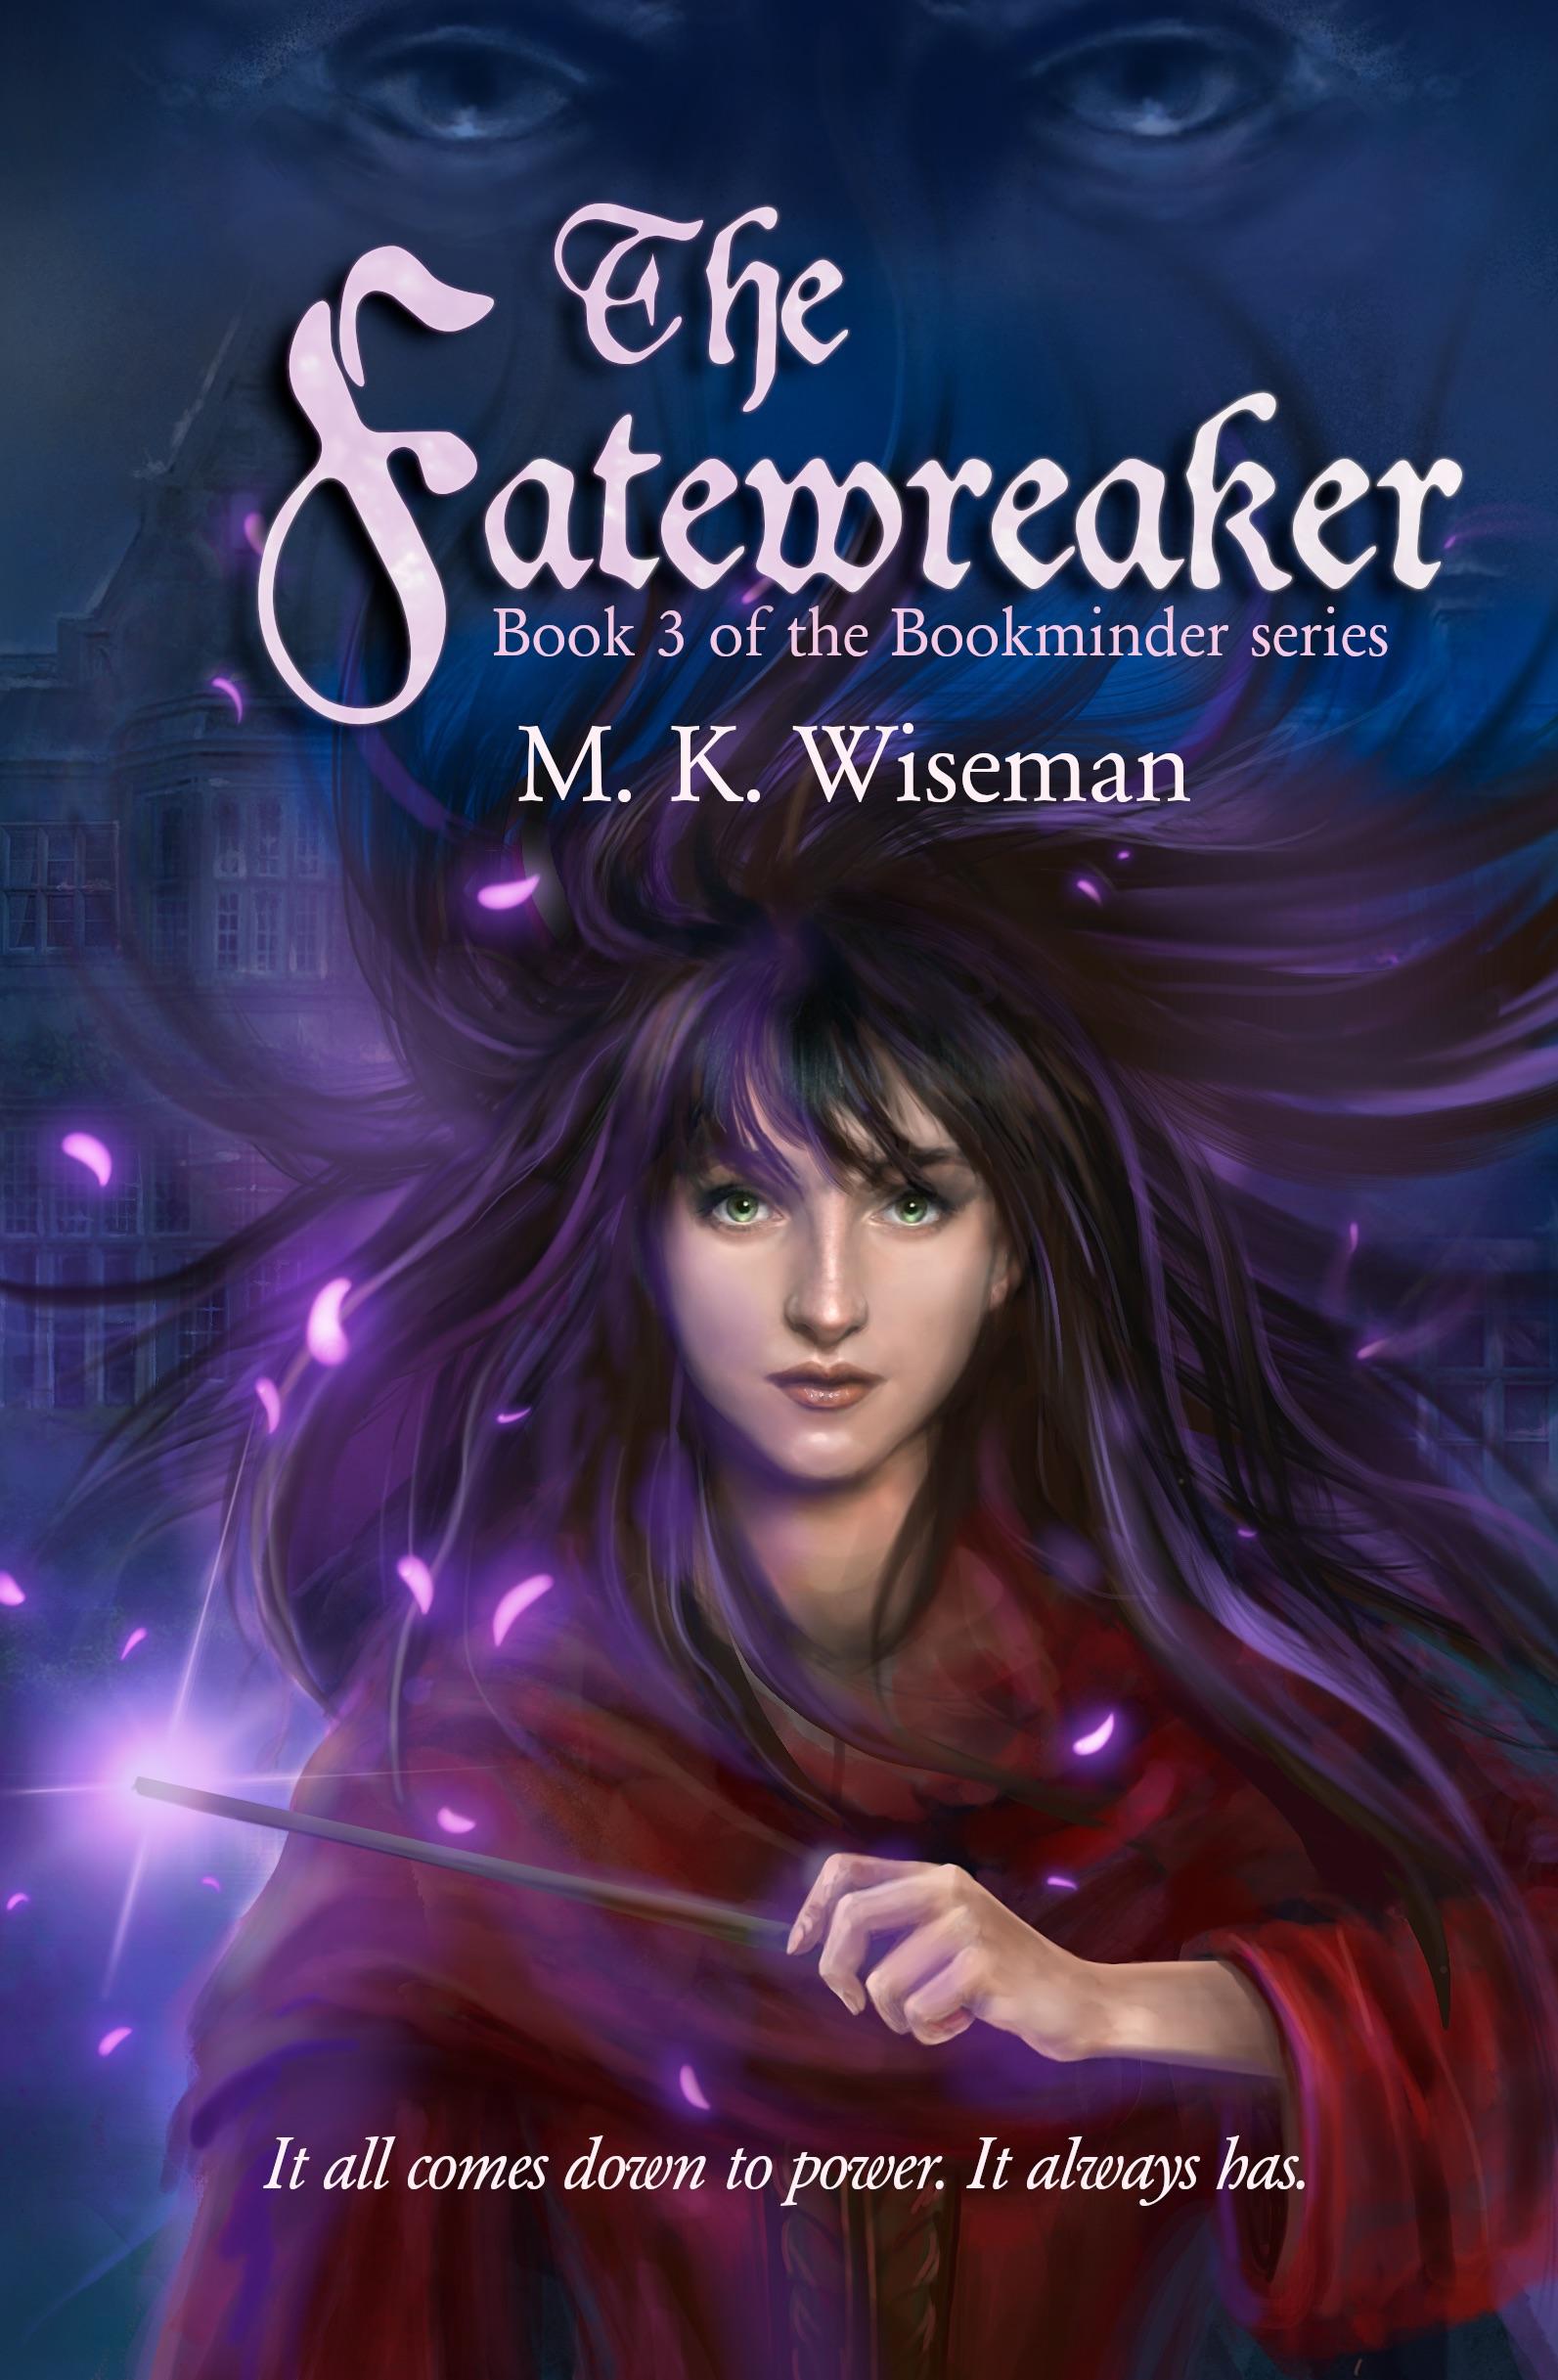 The Fatewreaker (The Bookminder #3)